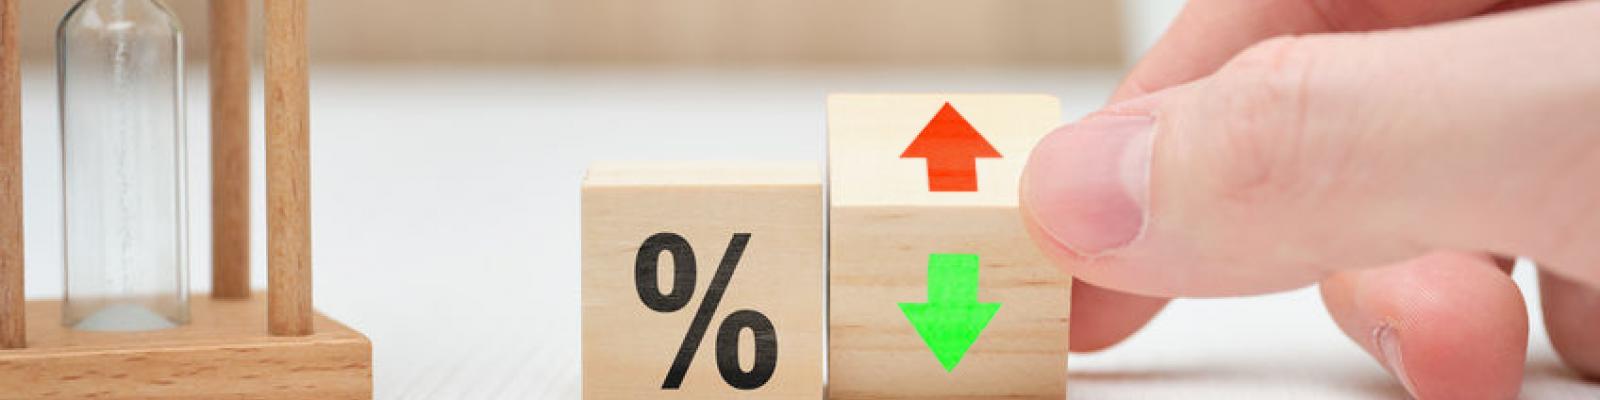 percentage teken rode pijl zandloper